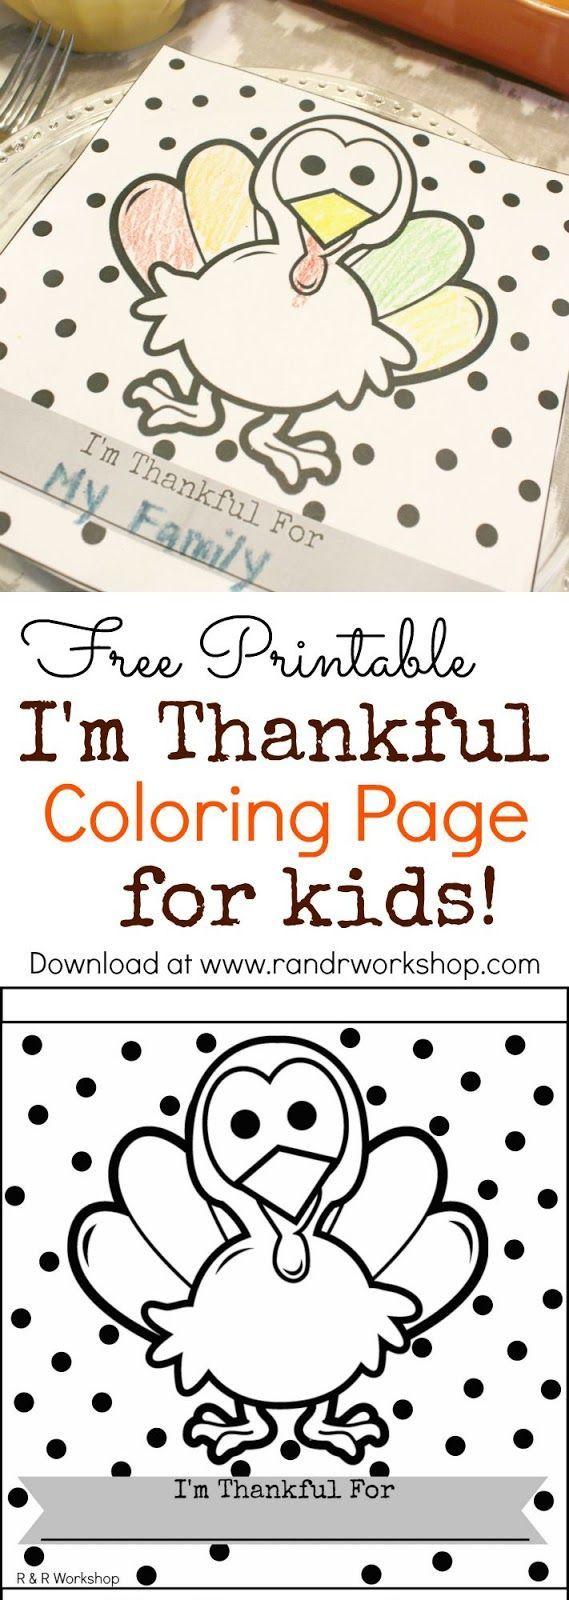 Kids Thanksgiving Coloring Page (Free Printable) | Free printable ...